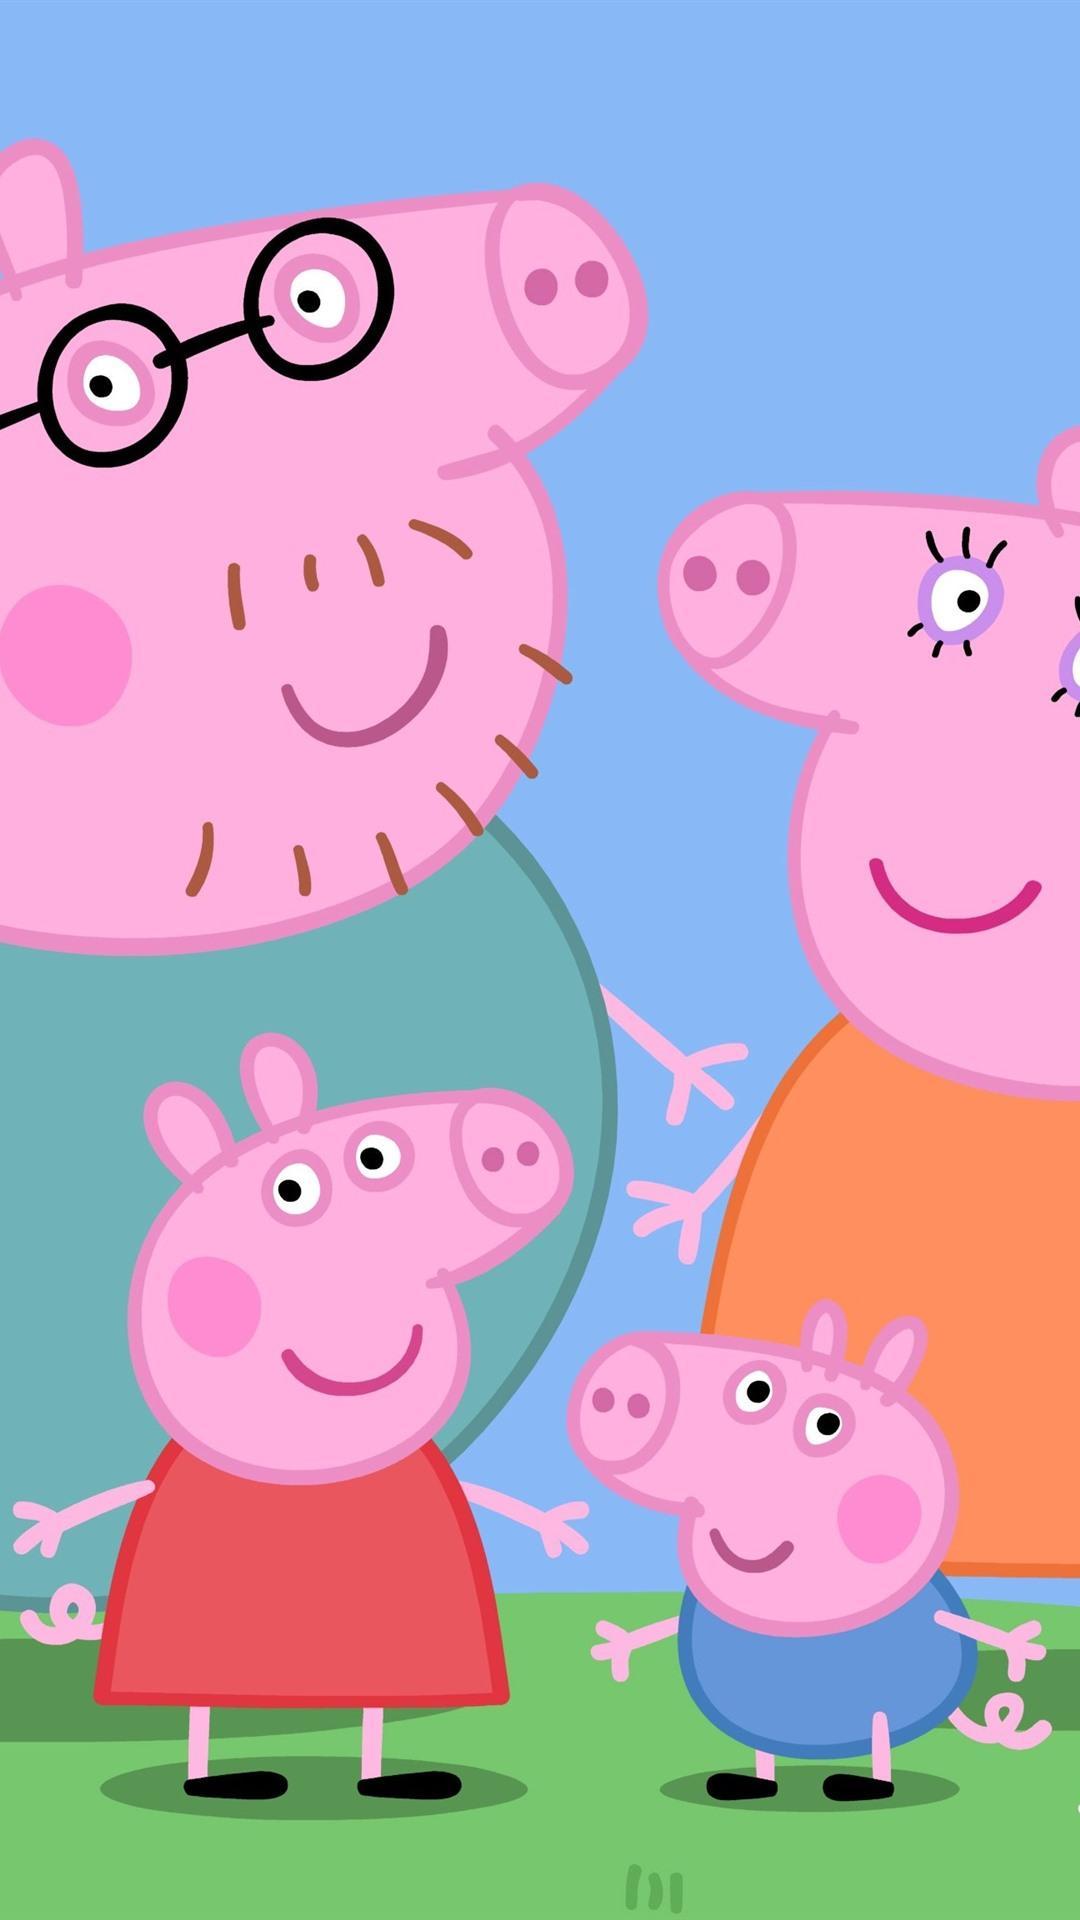 Peppa Pig Aesthetic Wallpapers - Wallpaper Cave